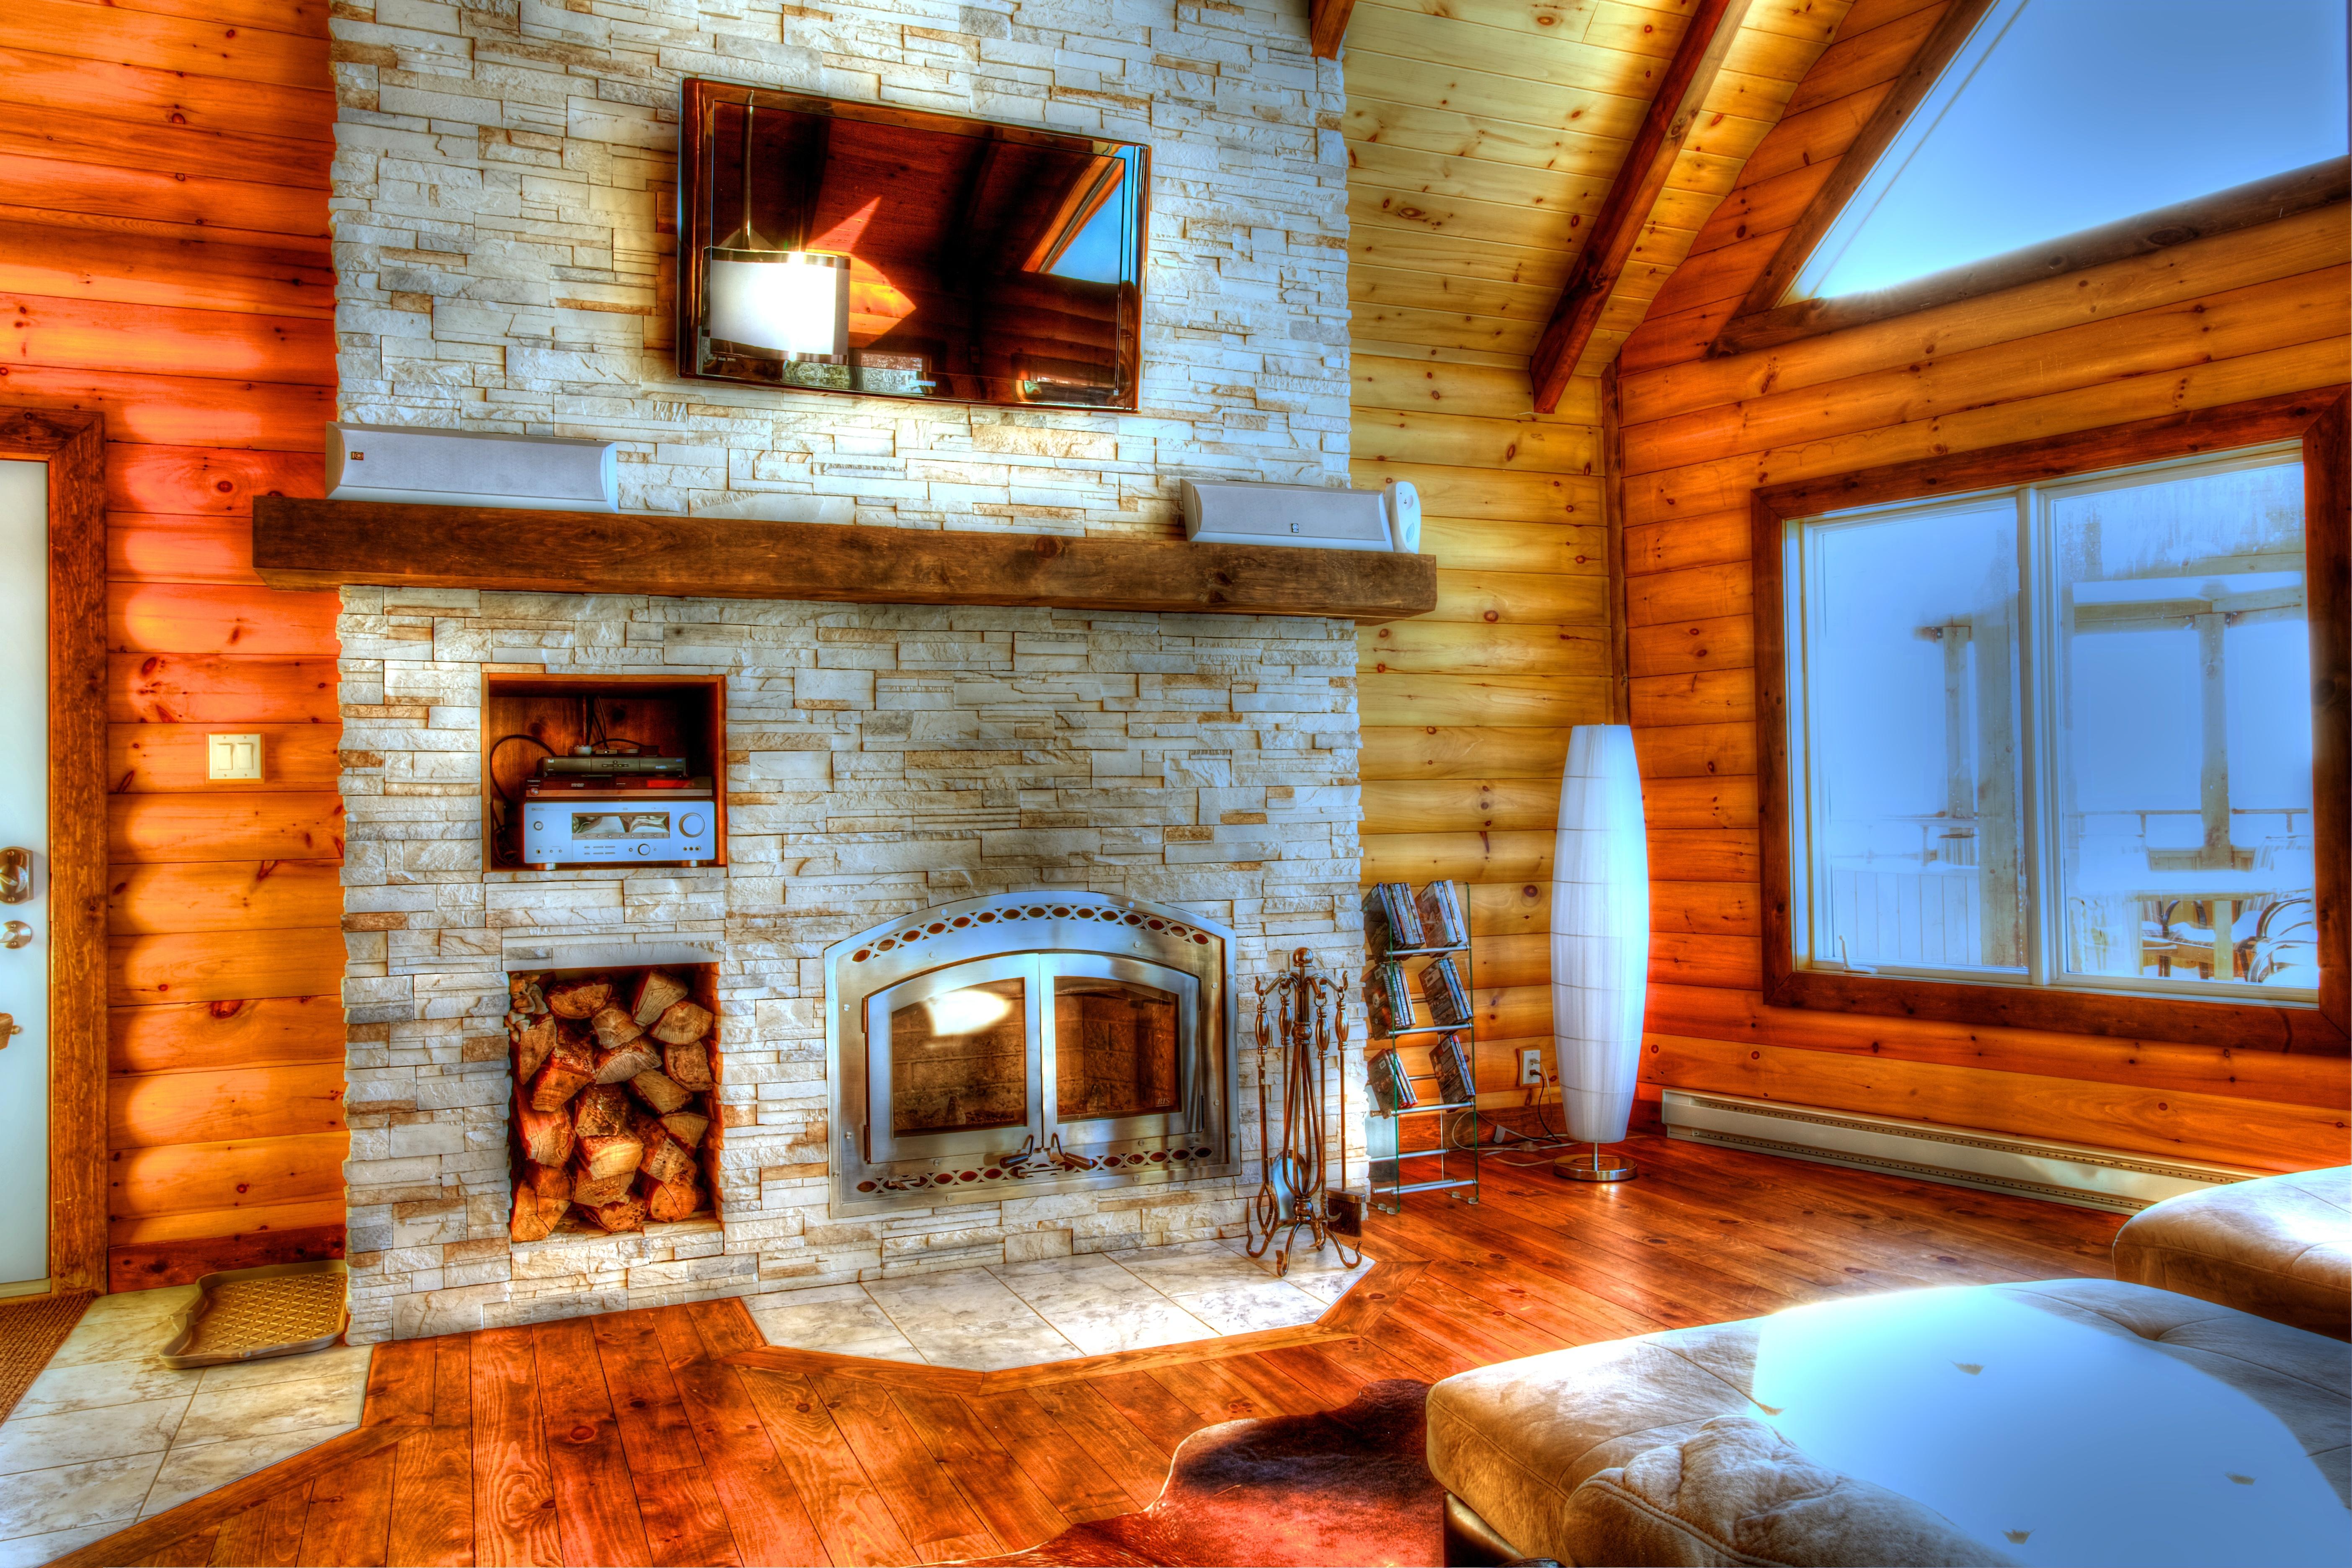 StBernard_Lac Simon Fireplace.jpg